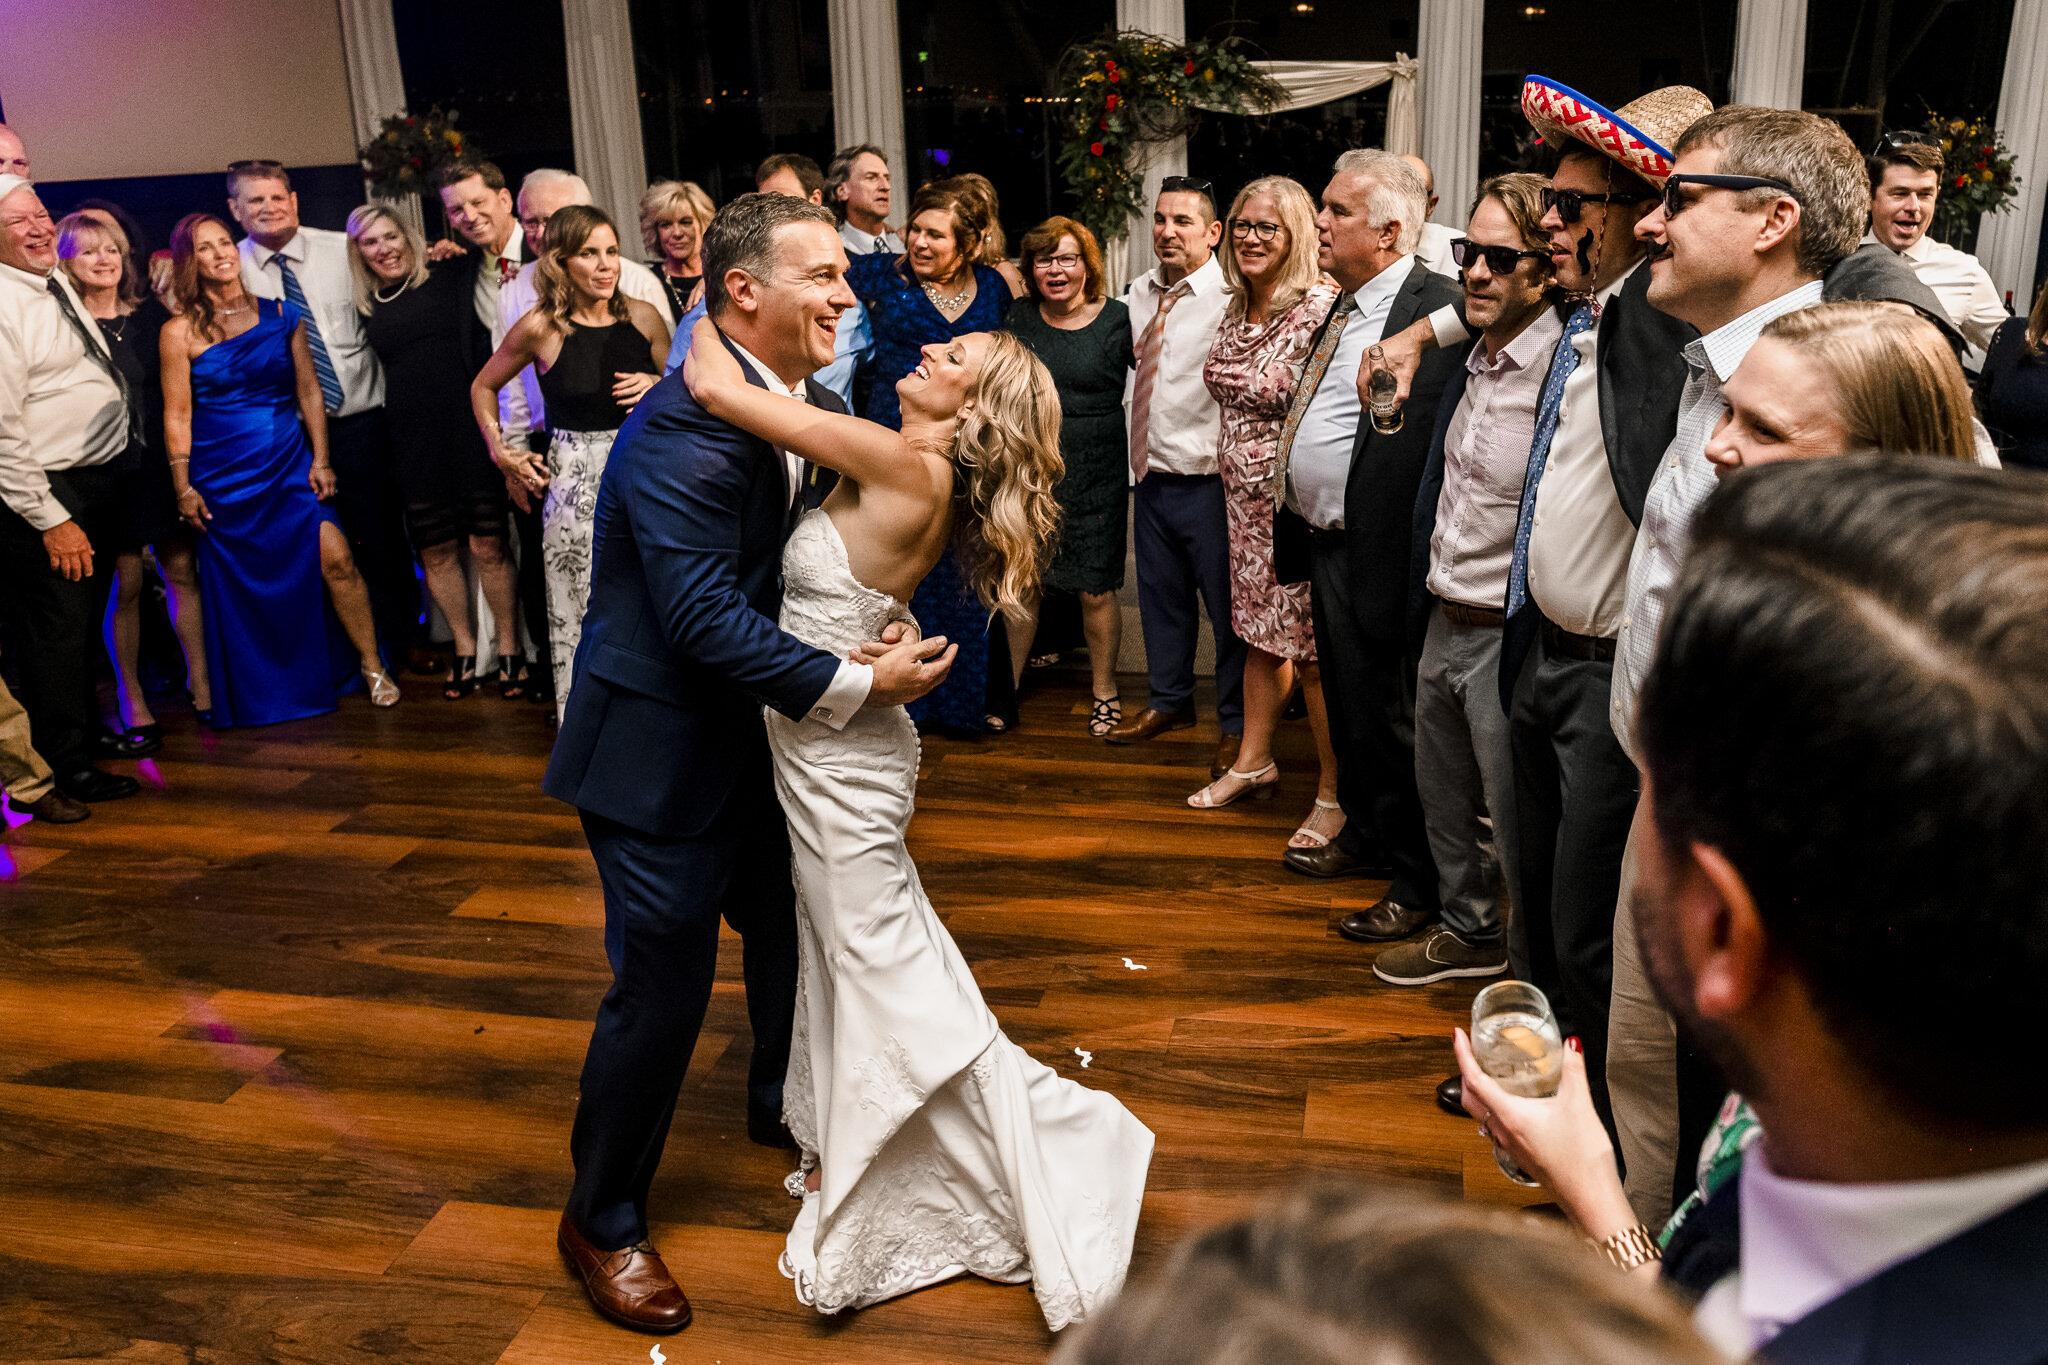 Snell-Ocean-City-Yacht-Club-New-Jersey-Wedding-Photographer-50.JPG